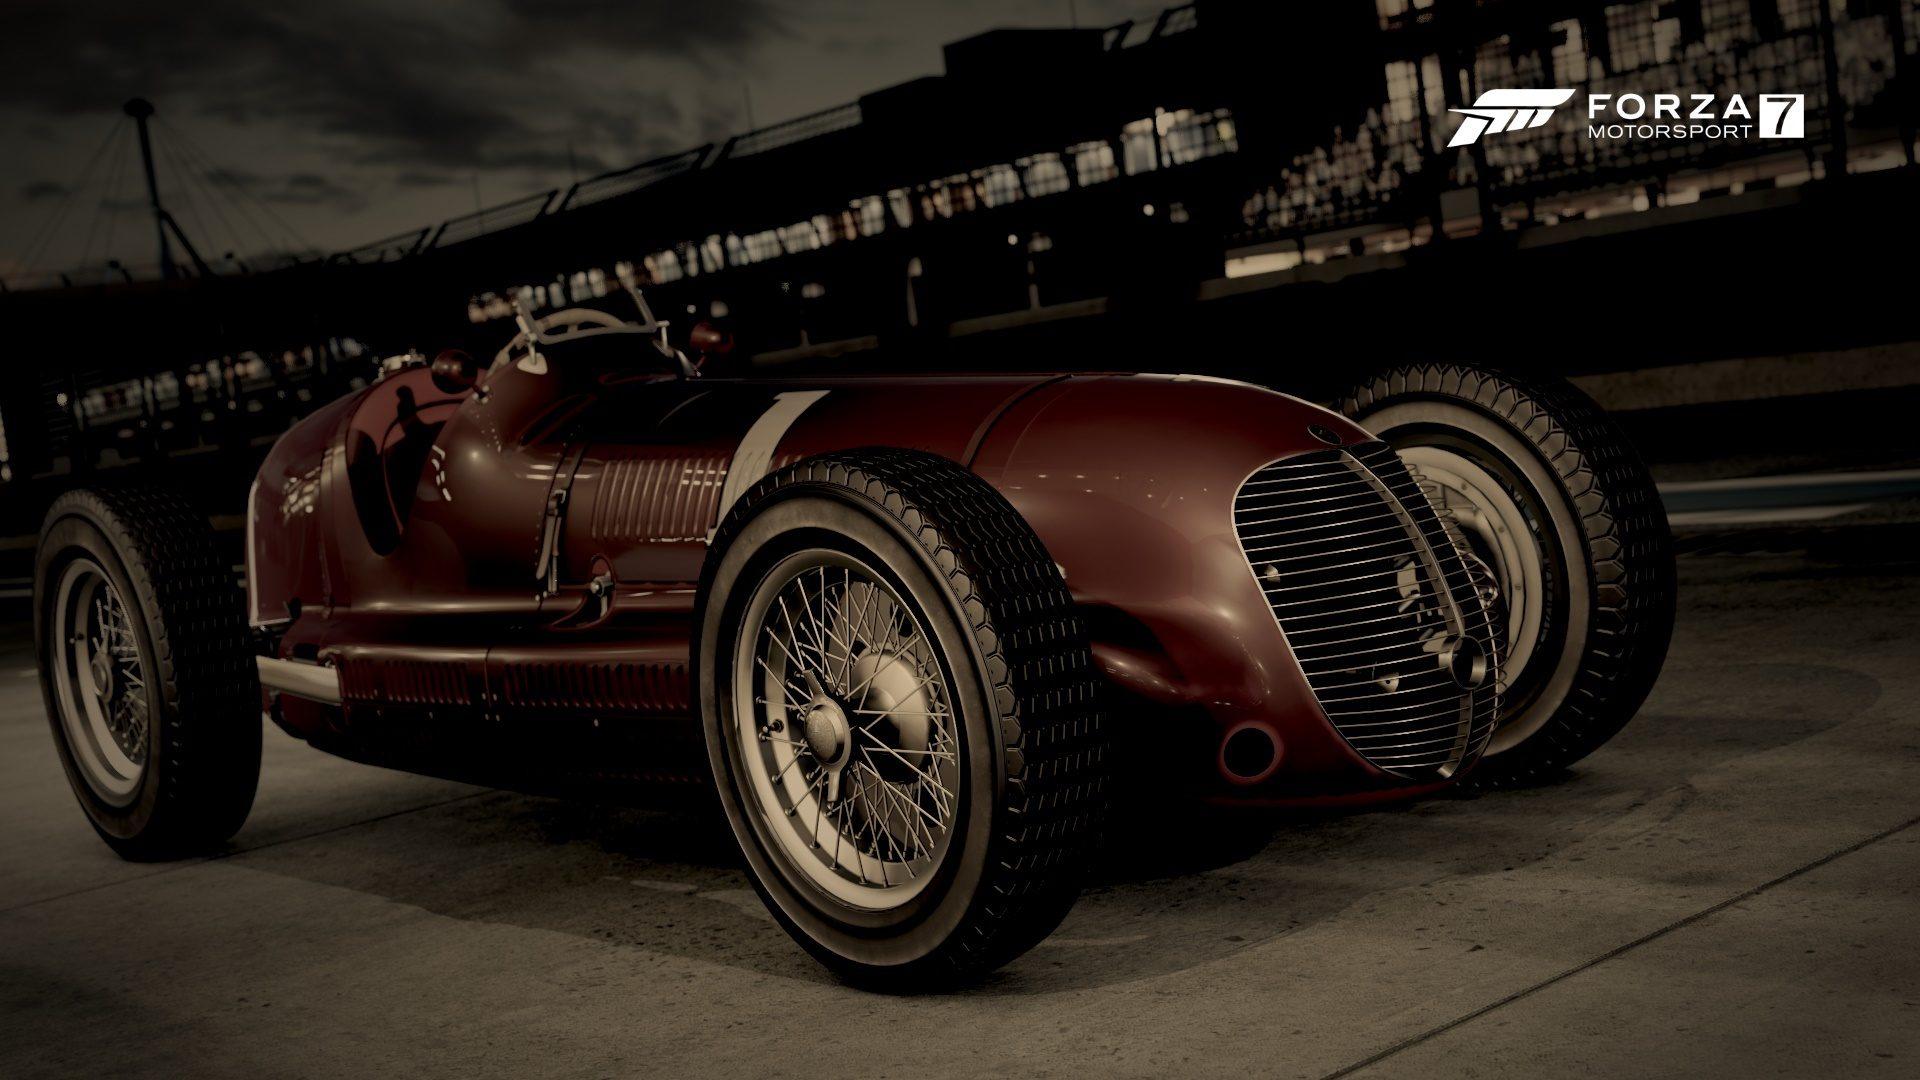 Forza-Motorsport-7-Maserati-8CTF-GTDNick72.jpg